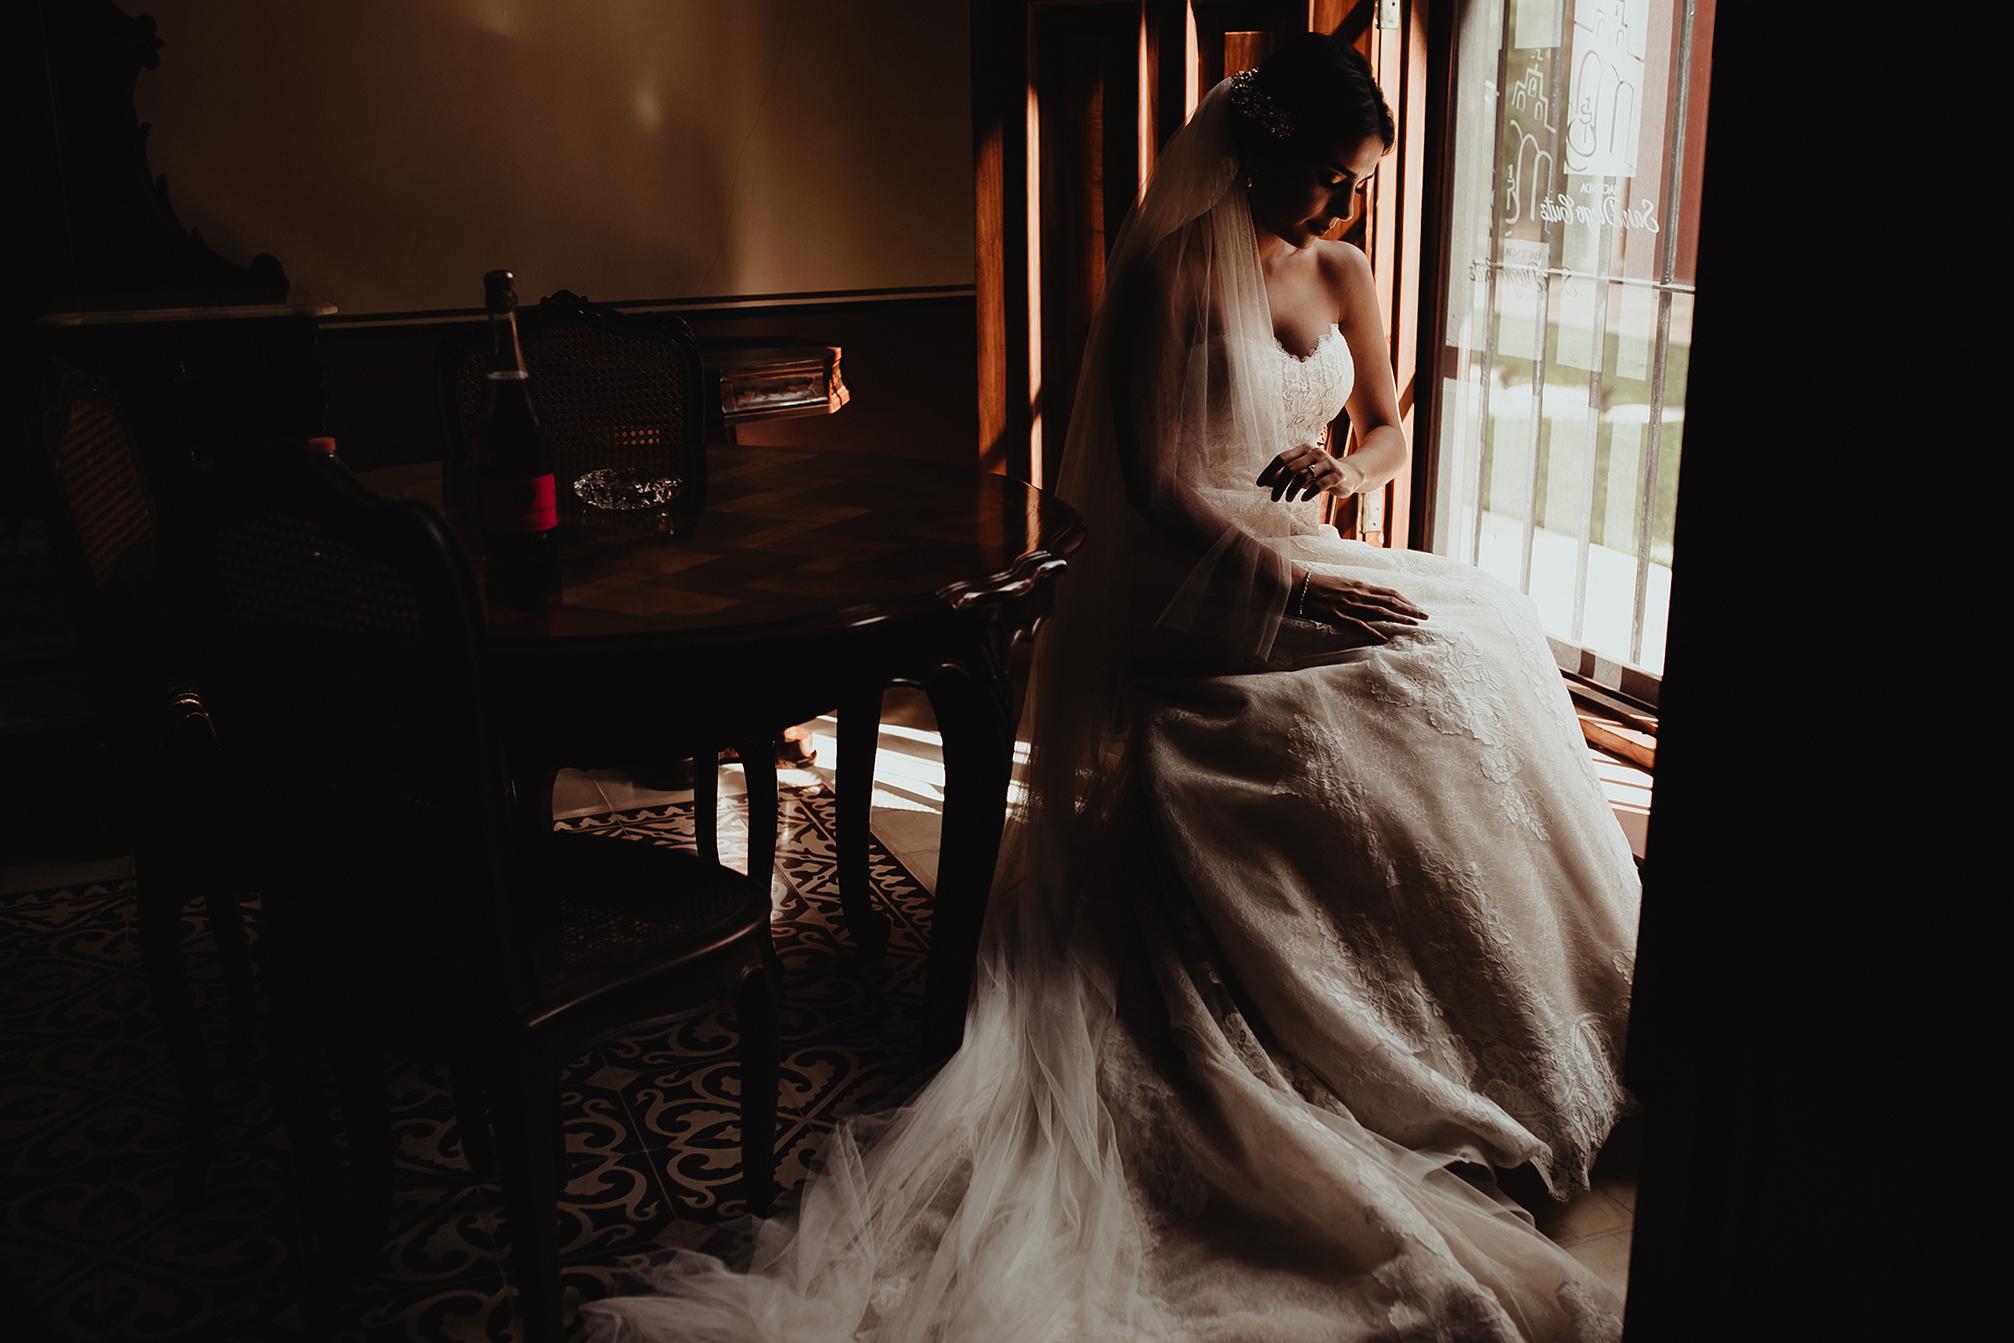 0119F&Yslide_WeddingDstination_MeridaYucatan_HaciendasMerida_BodasMexico_BodasYucatan_Boda_Destino.jpg